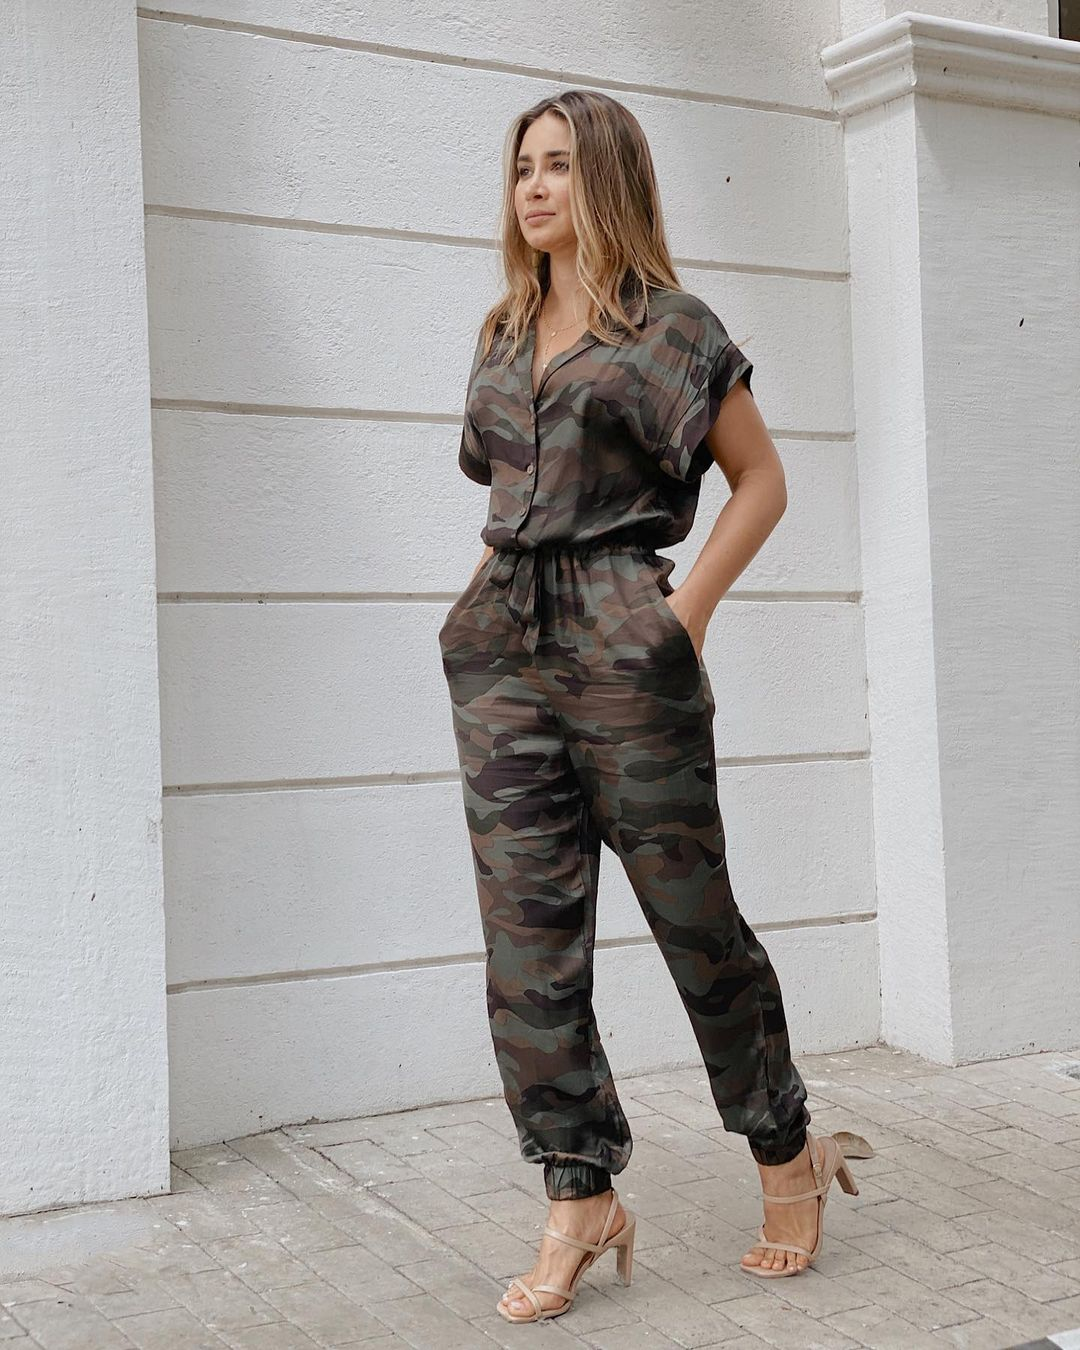 prendas-estilo-militar-para-mujer-madura (5)